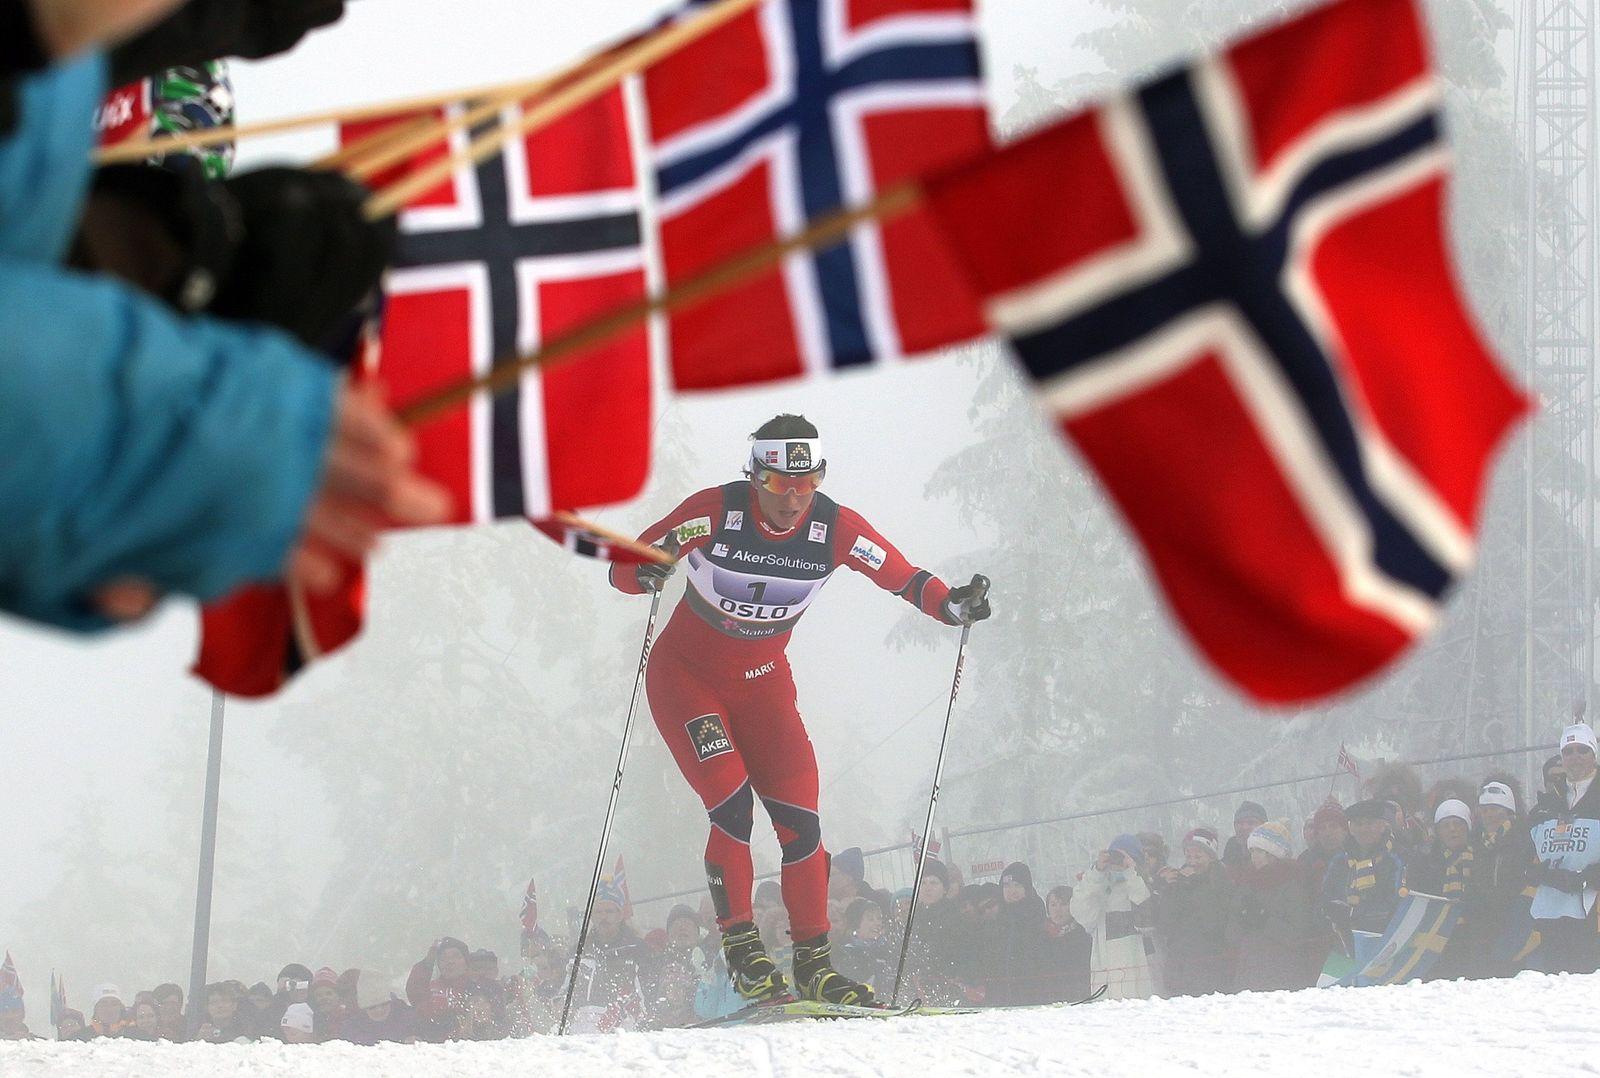 Nordic Skiing World Championships 2011